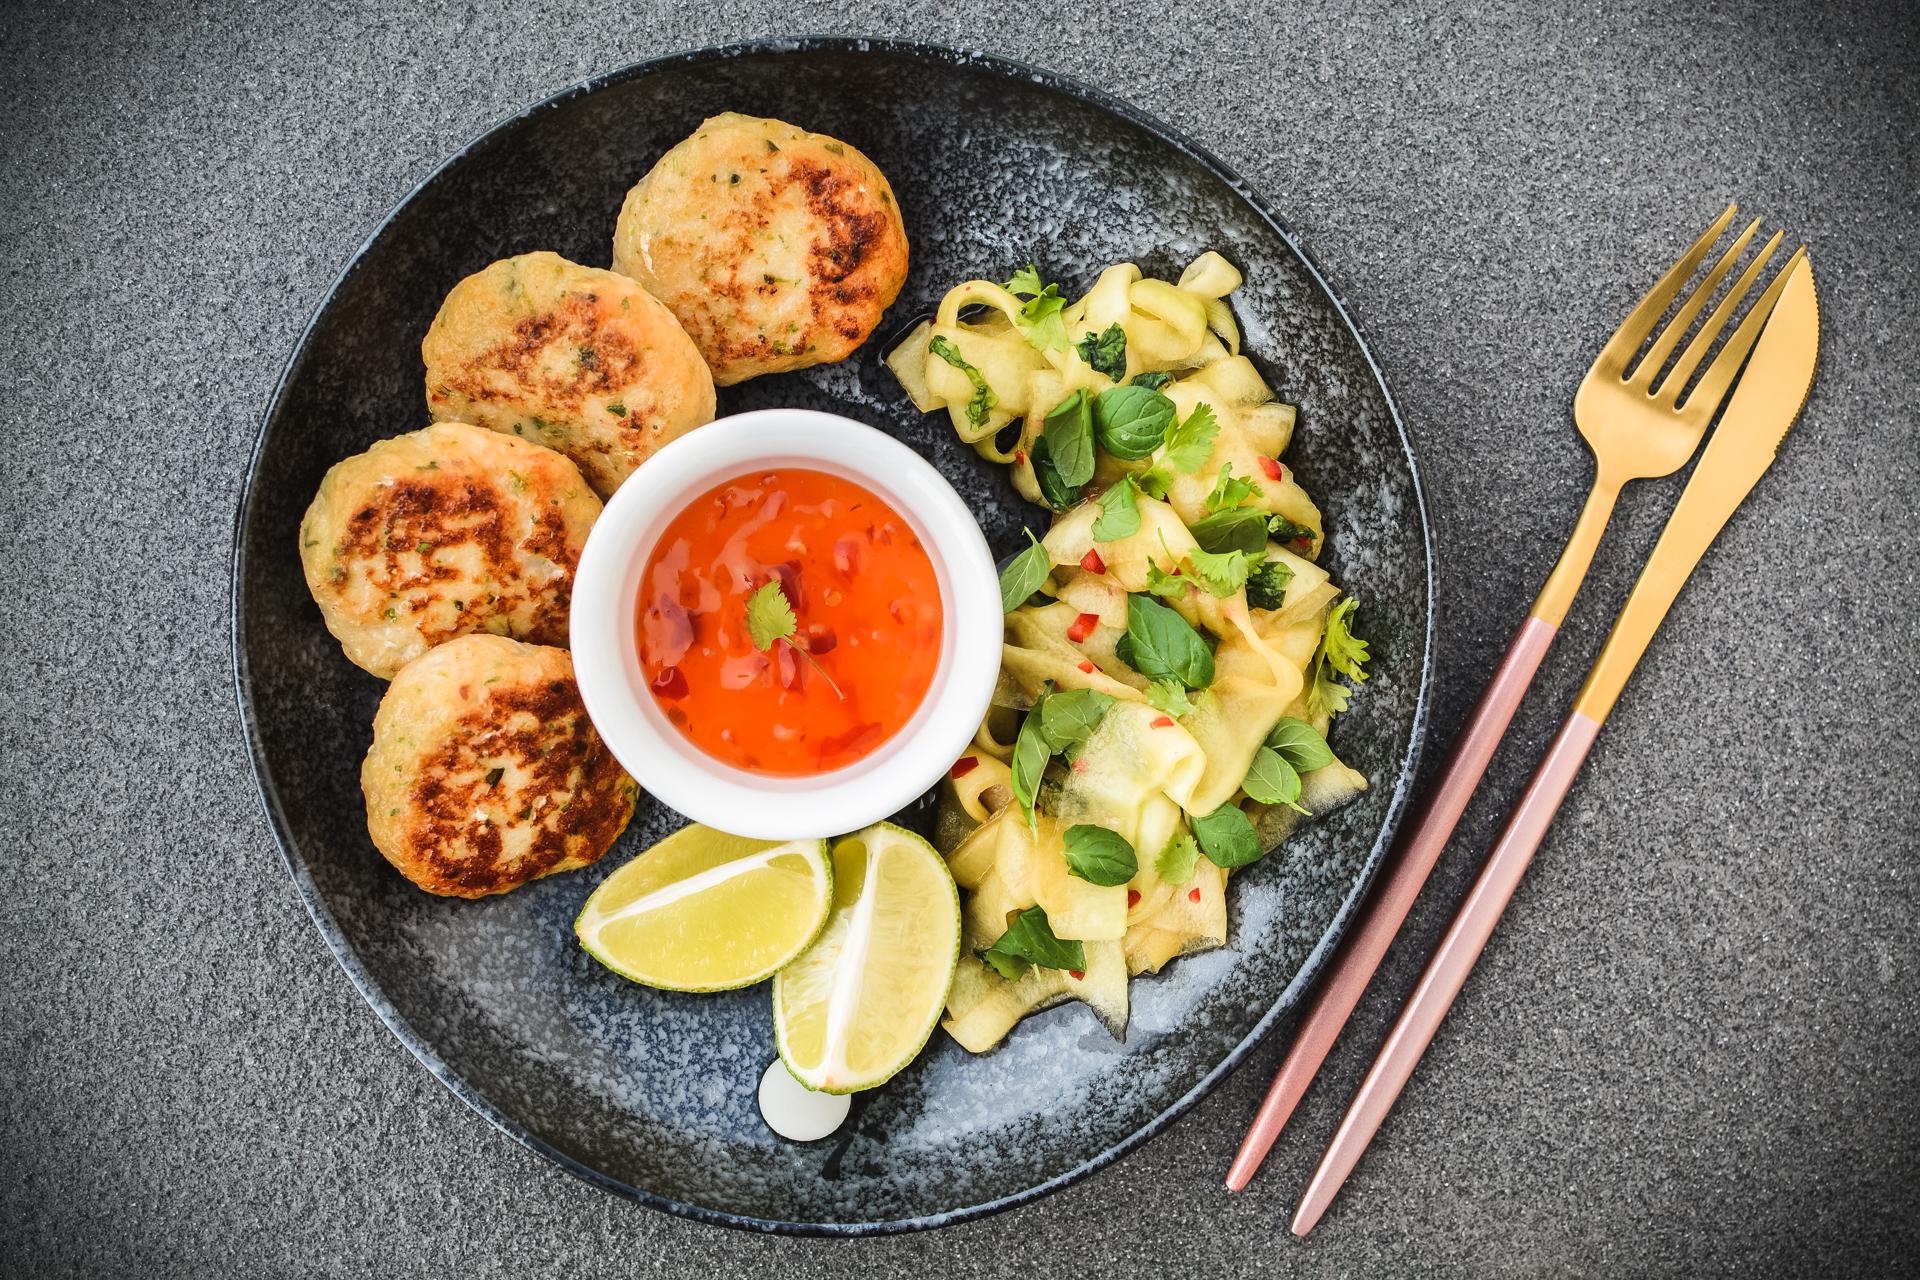 Tajskie kotleciki rybne - zdrowe i lekkie kotlety z ryby